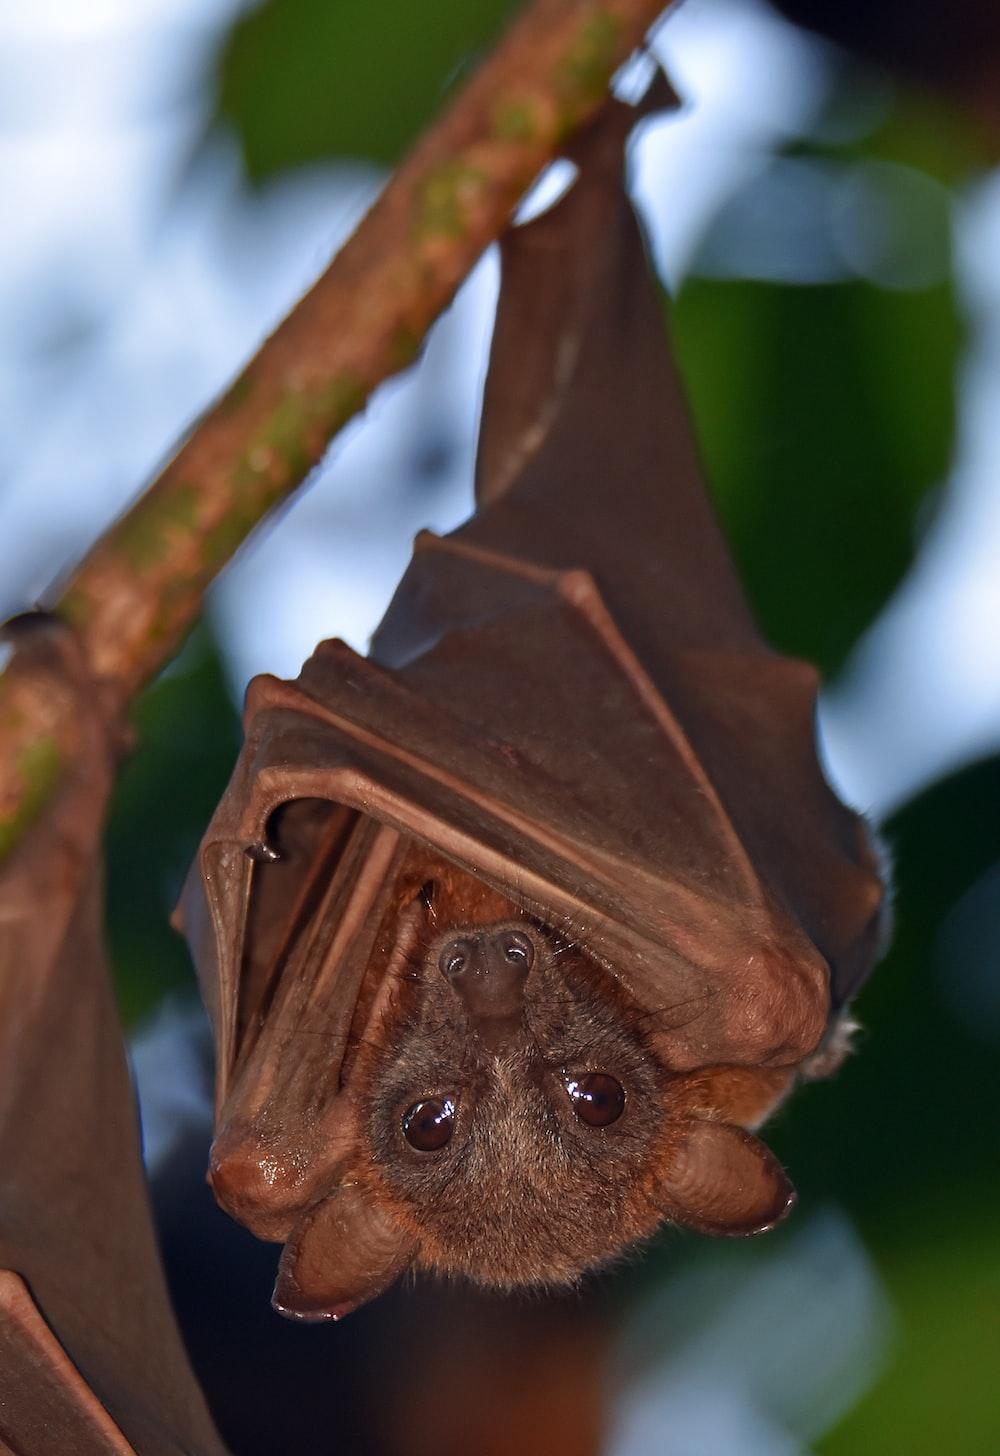 brown bat in close up photo